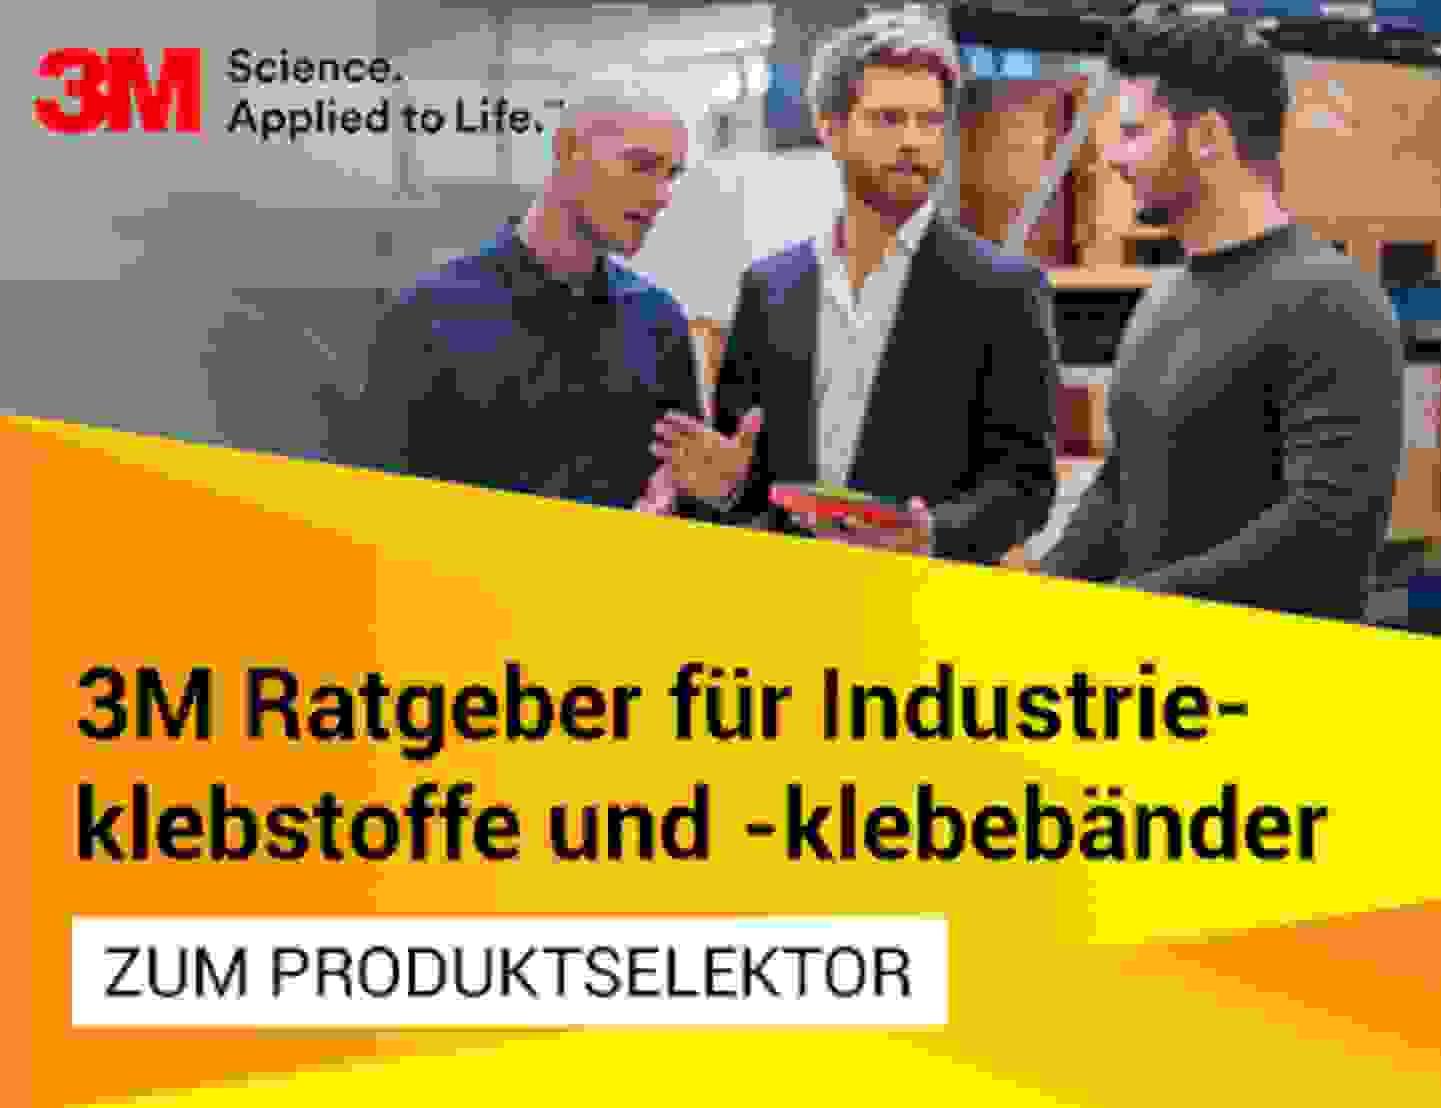 Industrieklebstoffe und -klebebänder Produktselektor